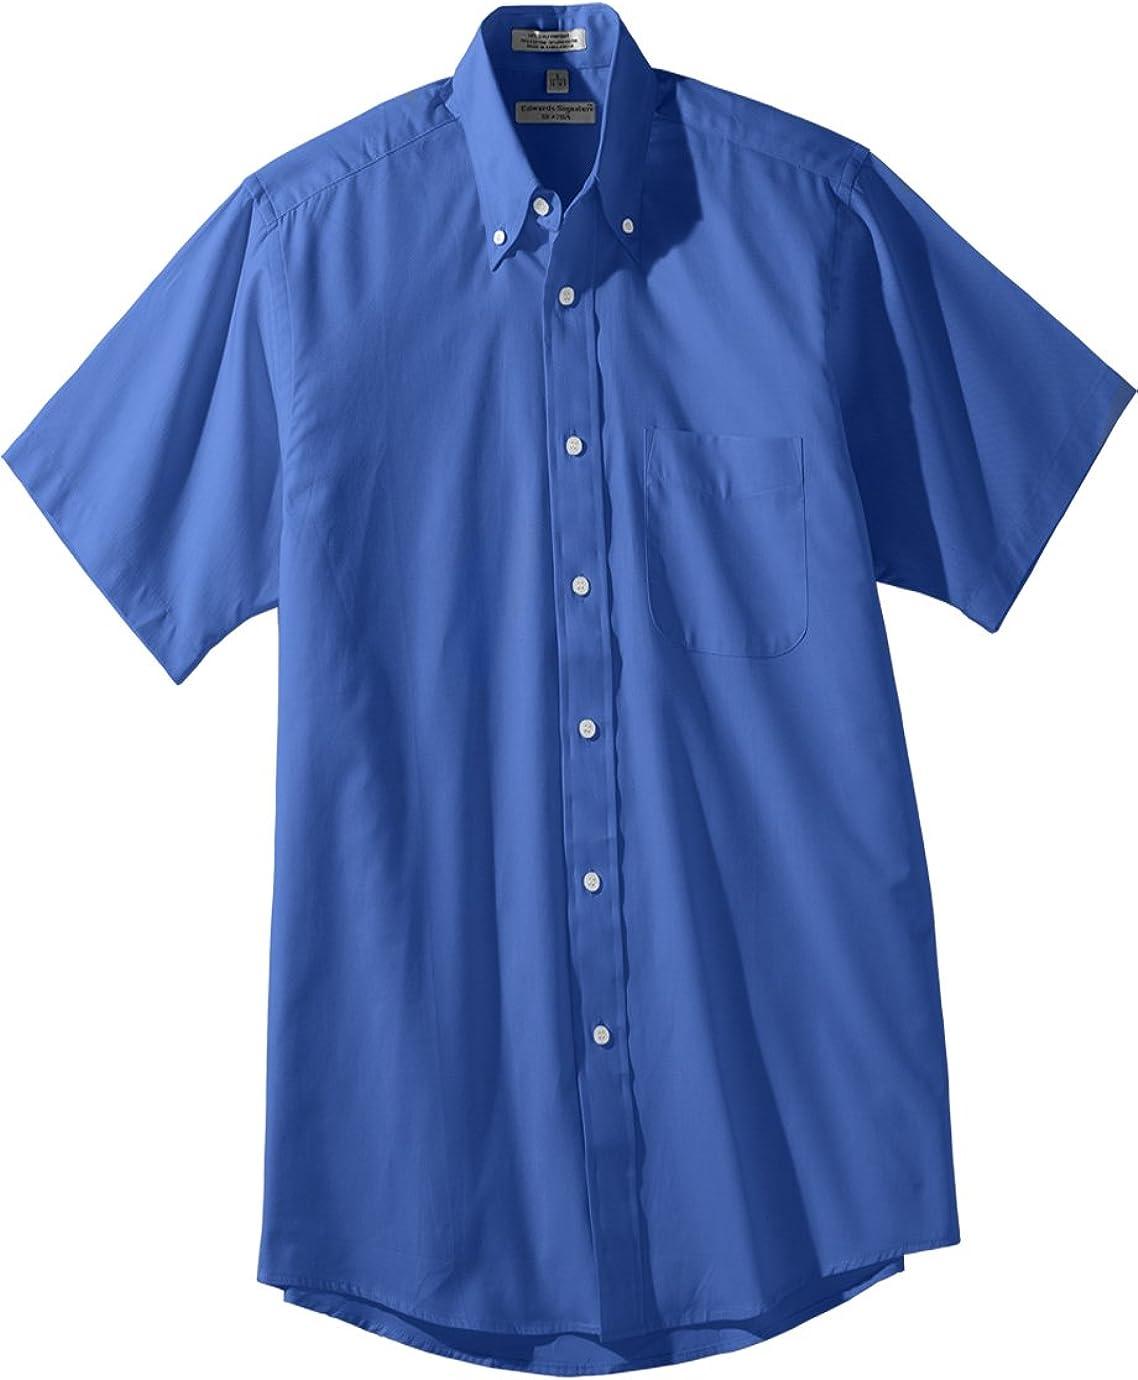 Ed Garments Men's Cotton/Poly Button Down Collar Machine Washable Dress Shirt